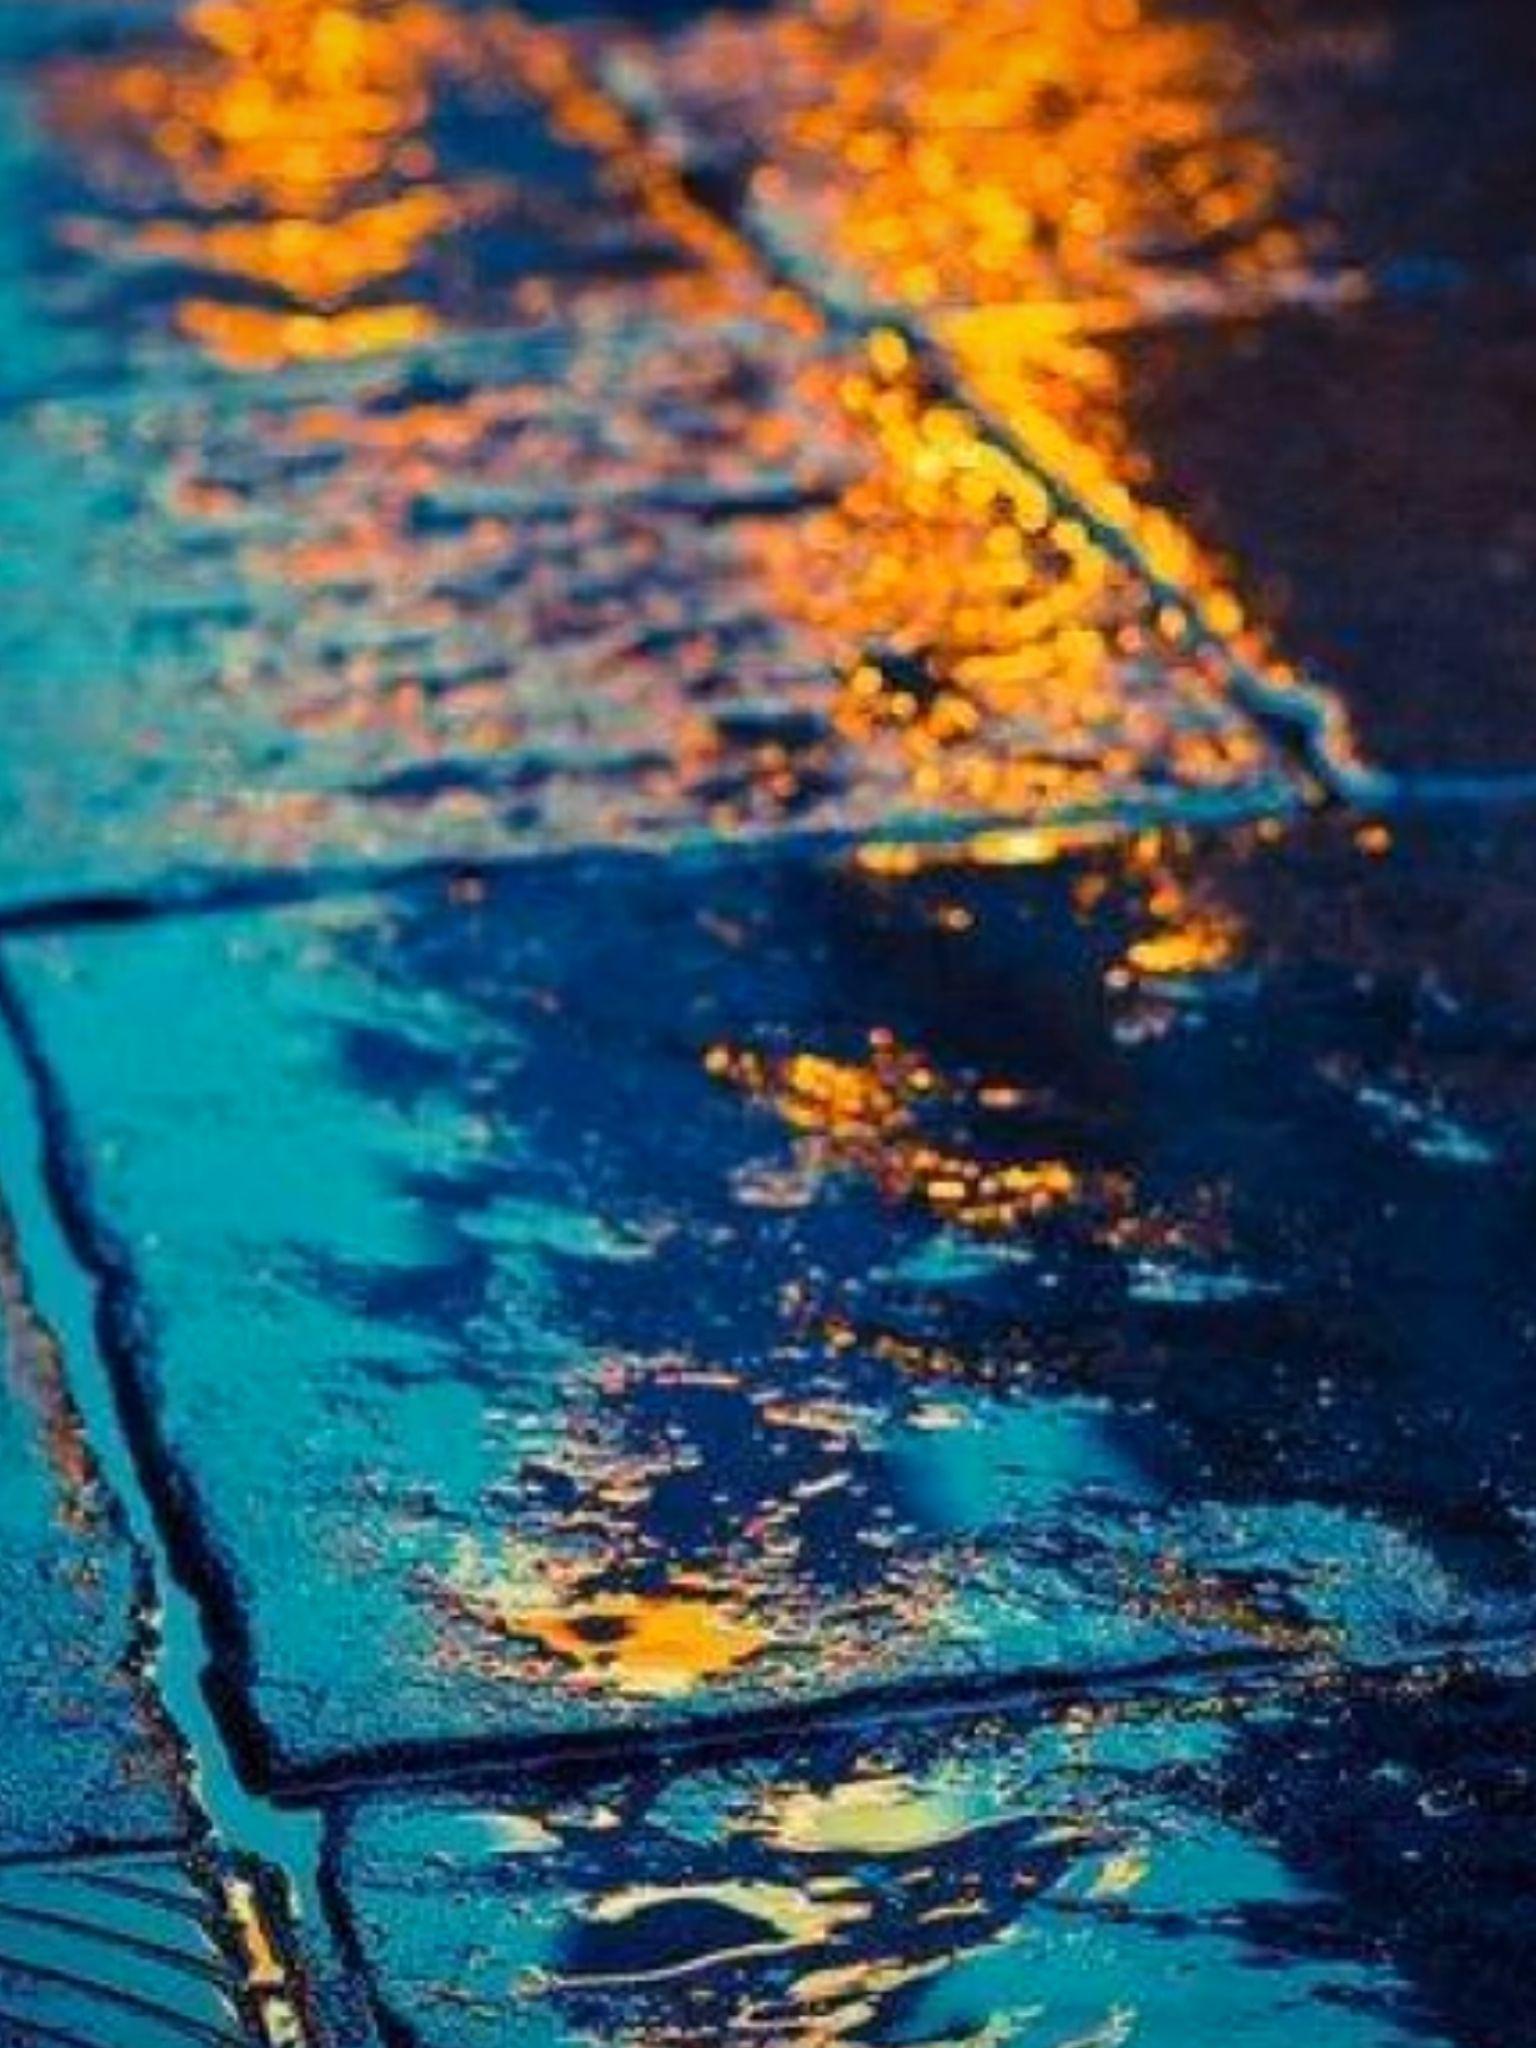 Raindrops amazing pictures pinterest amazing pictures